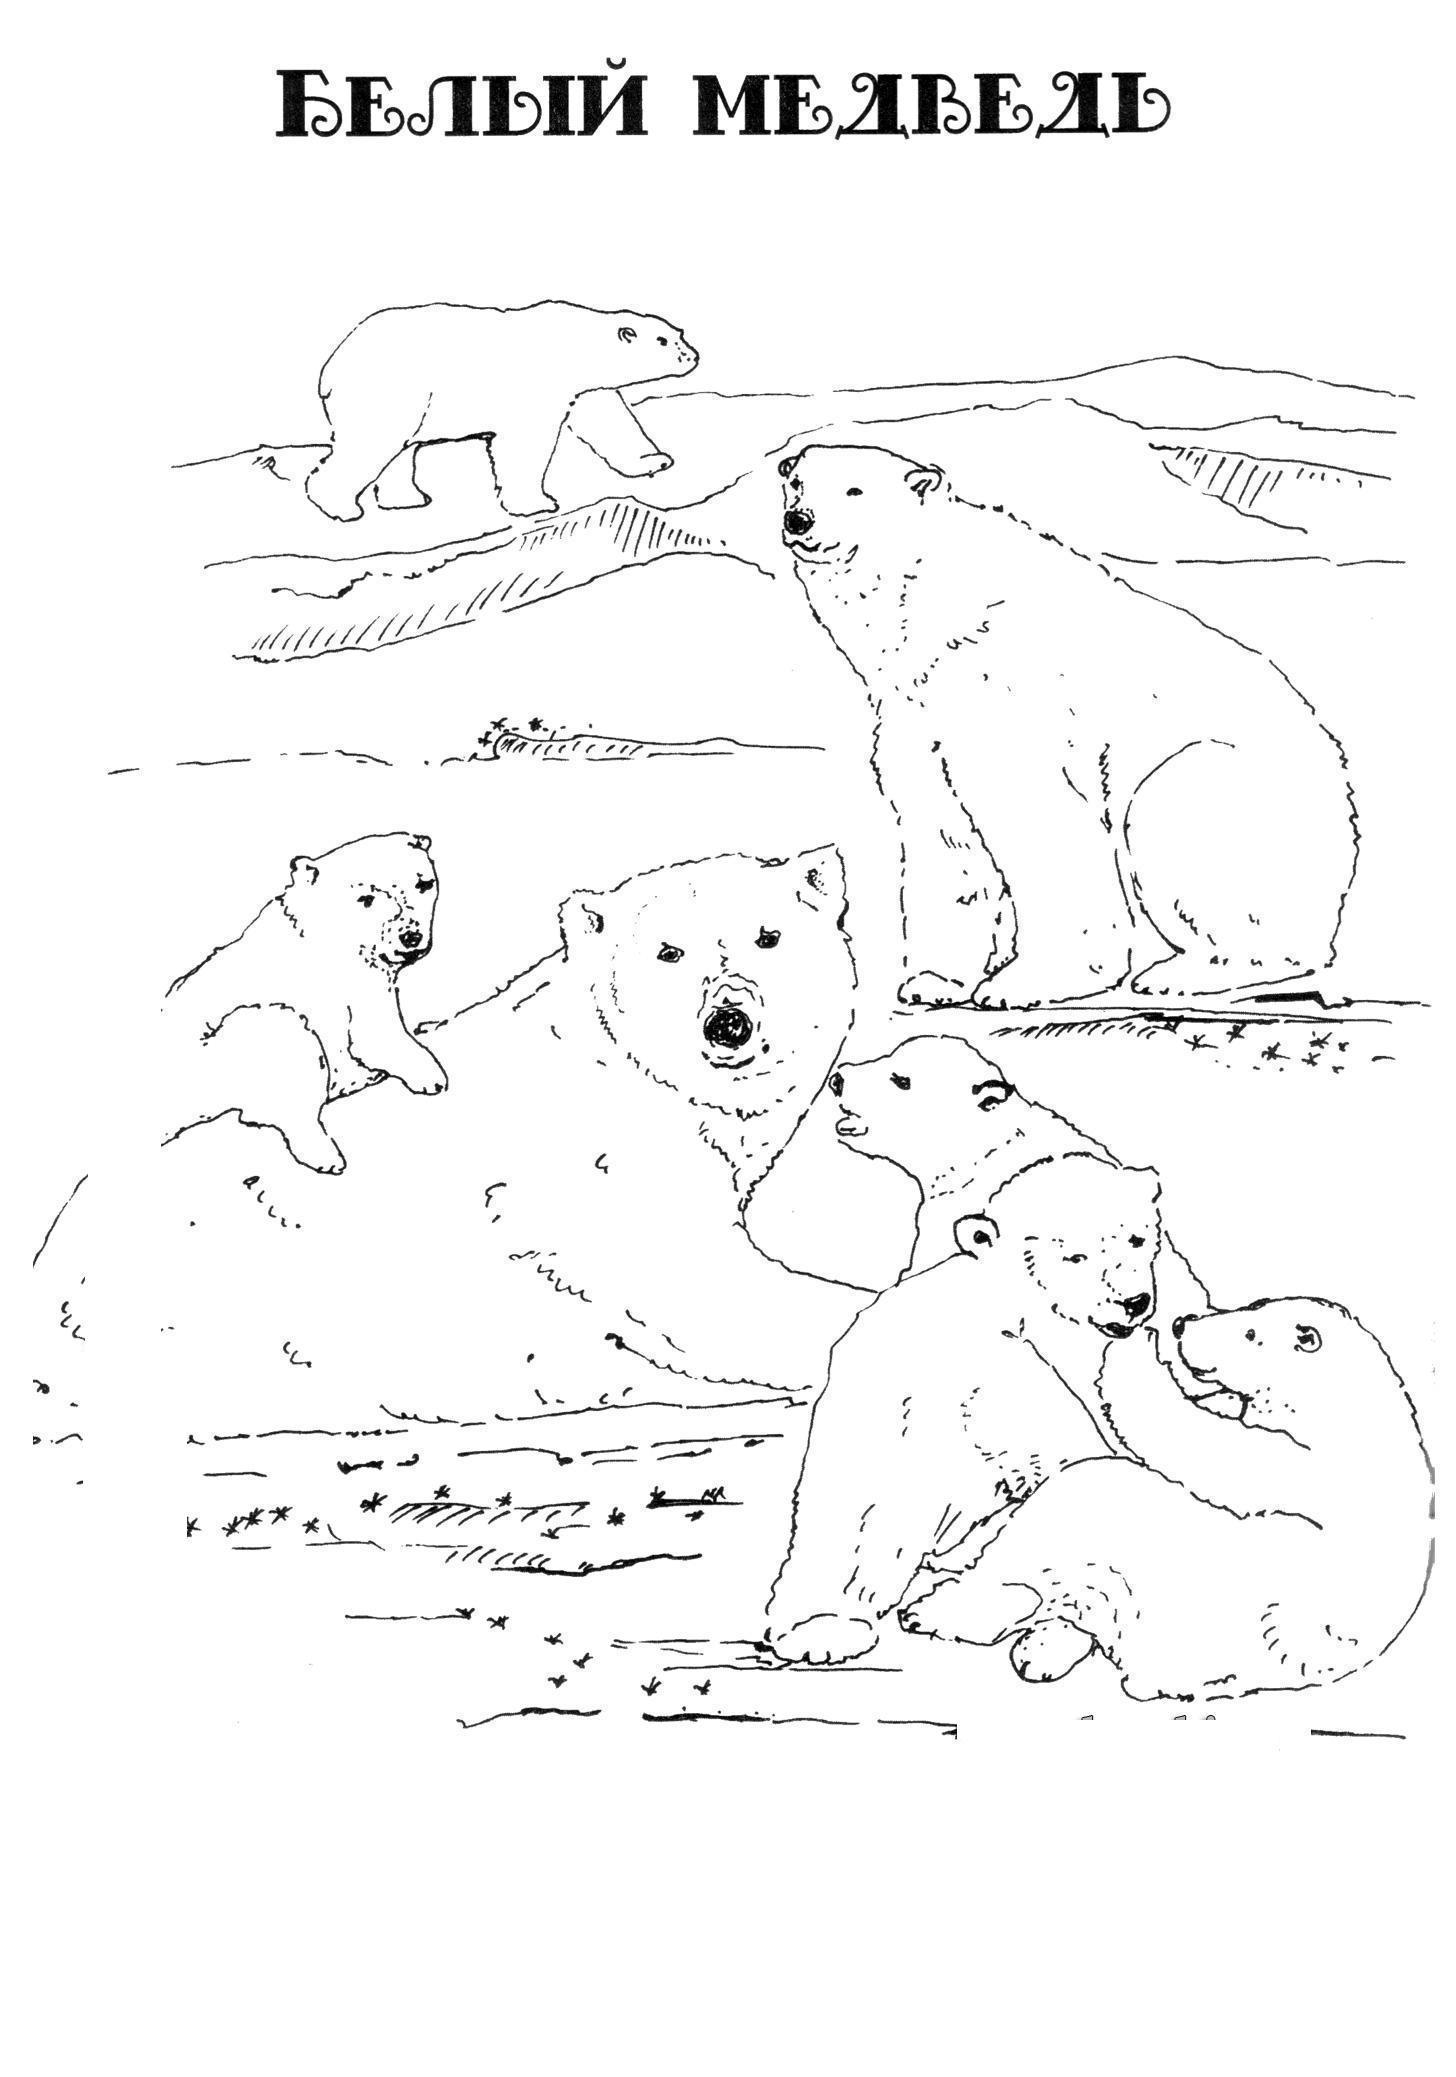 Раскраска белый медведь в jpg